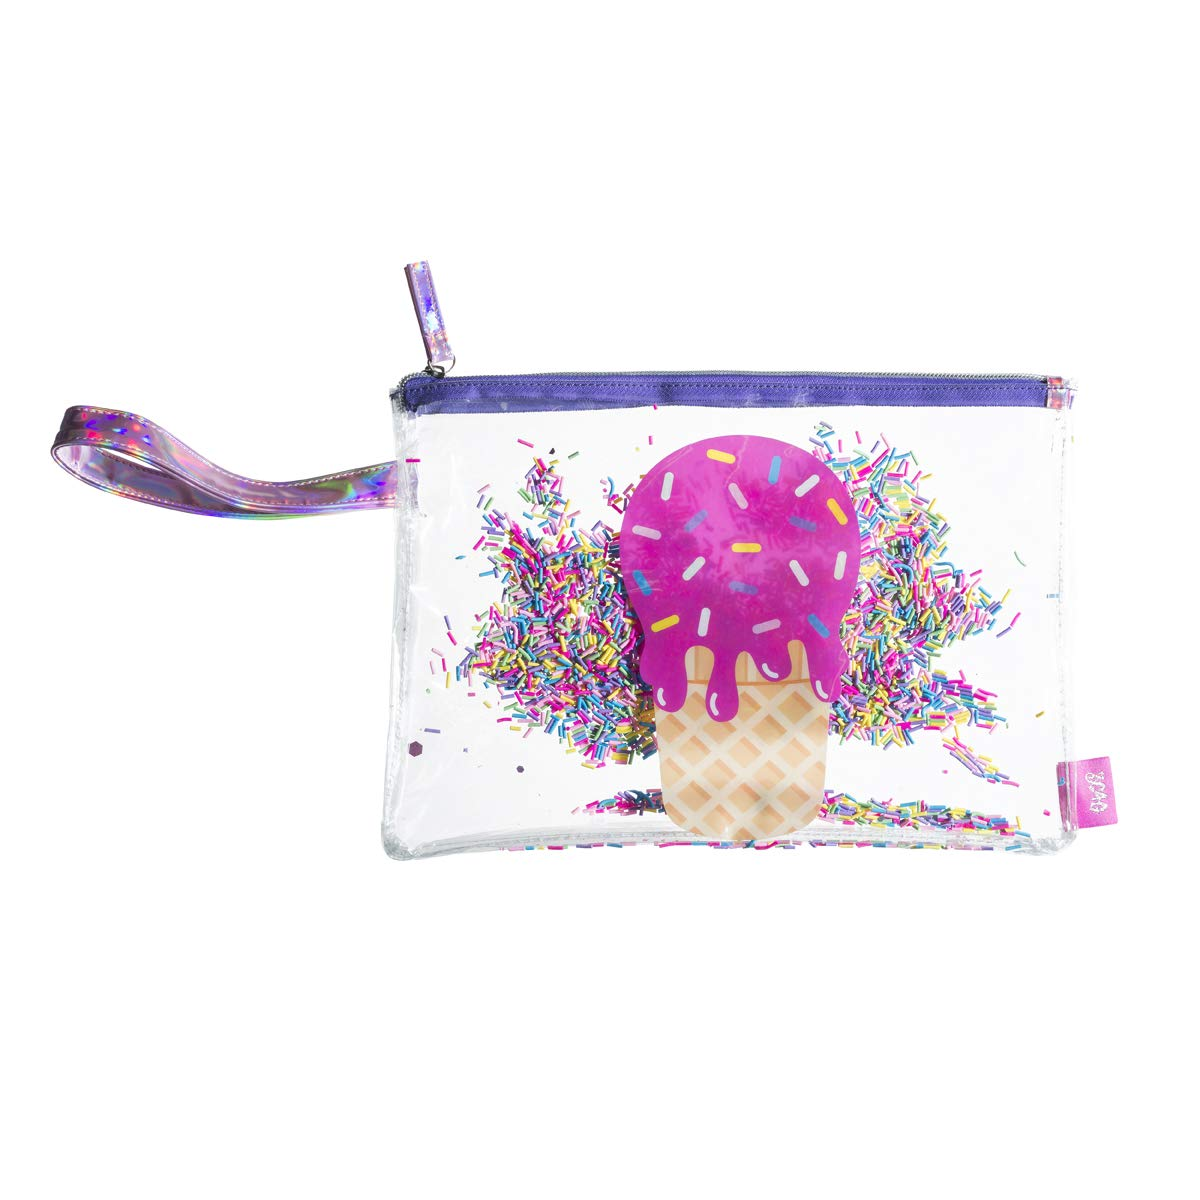 91c7dc9a3d41 Amazon.com: Zippered Bikini Bag Tote – Waterproof Double Layered PVC ...